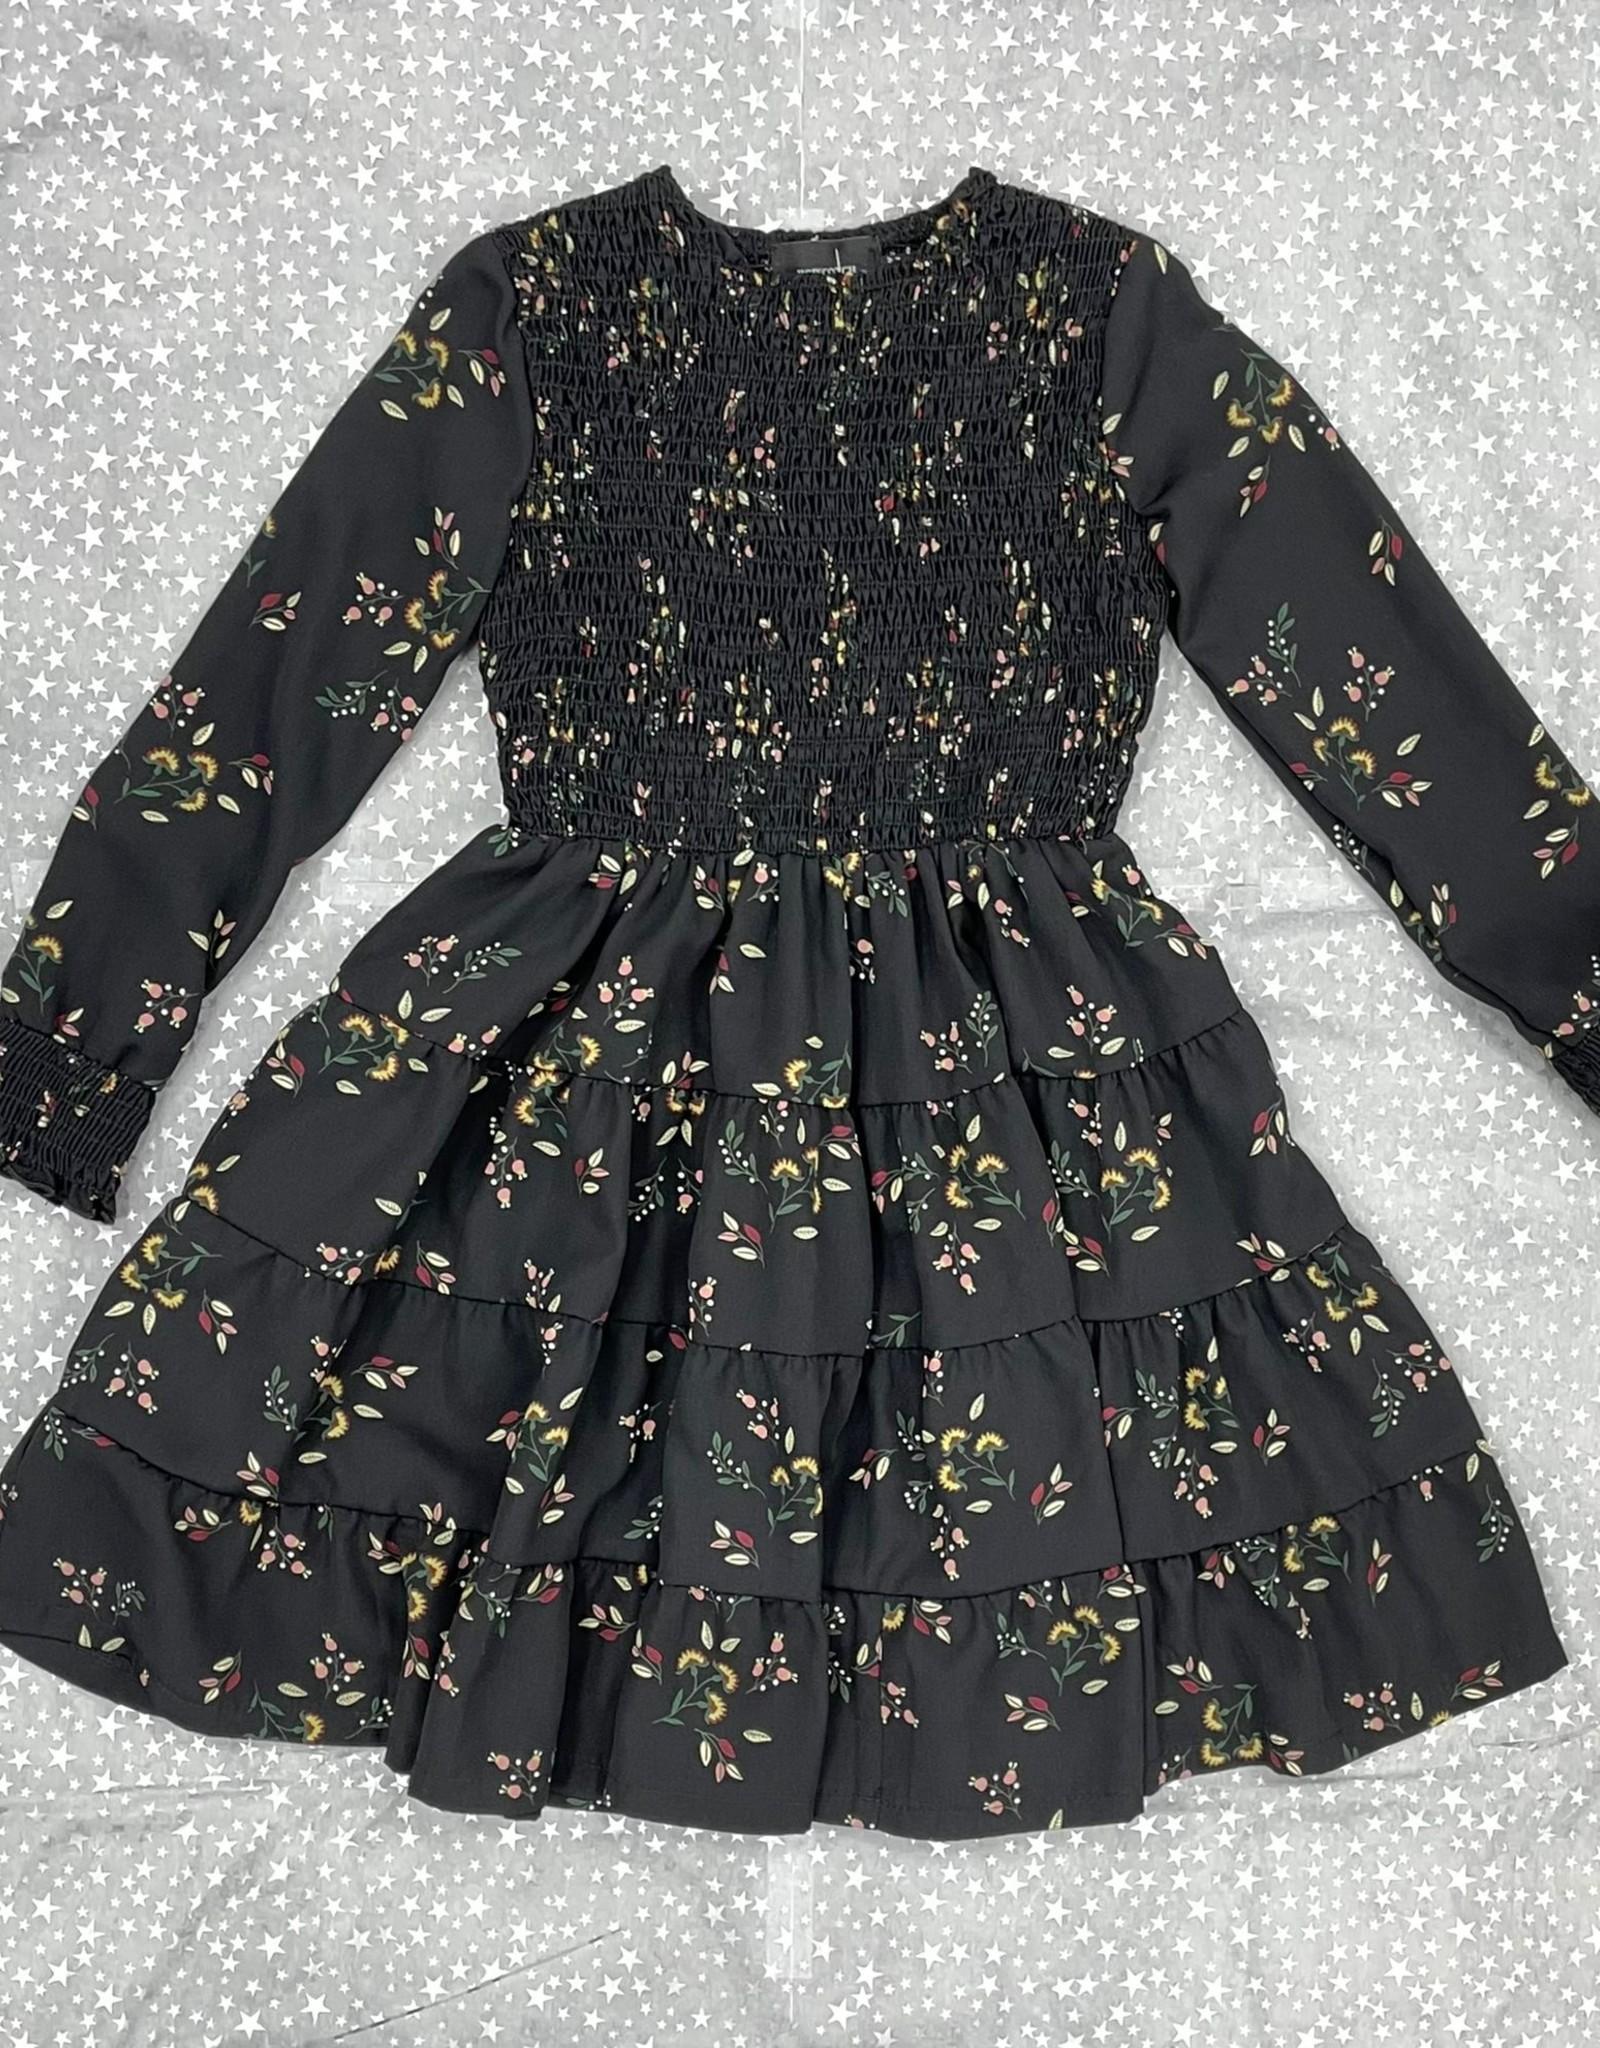 Hopscotch Hopscotch Leaf Printed Tiered Dress with Smocking